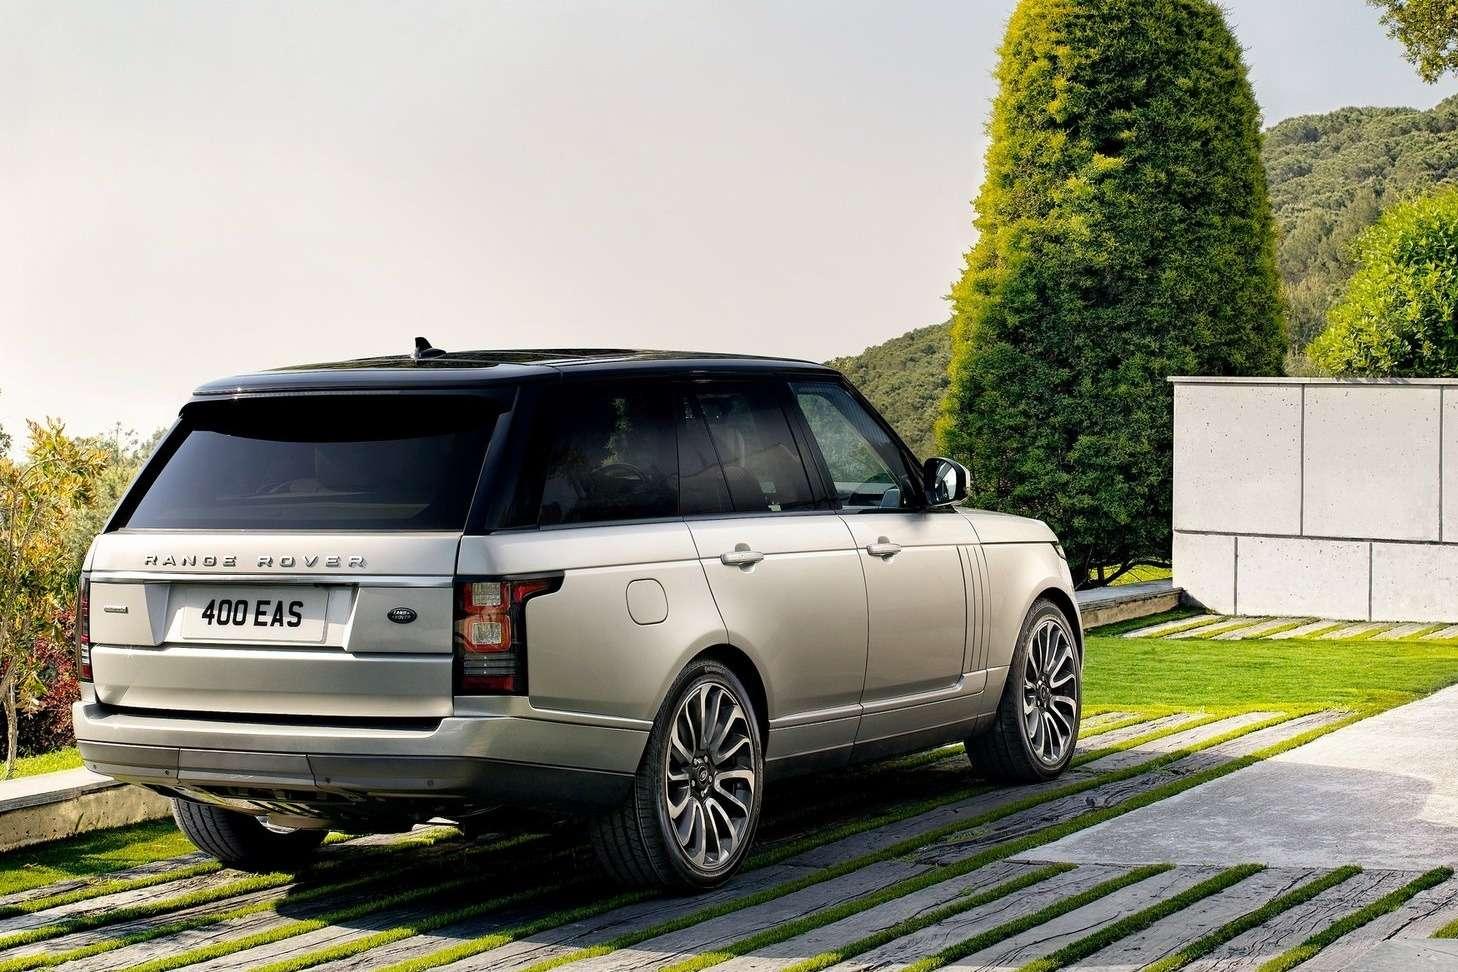 NewLand Rover Range Rover side-rear view 2_no_copyright